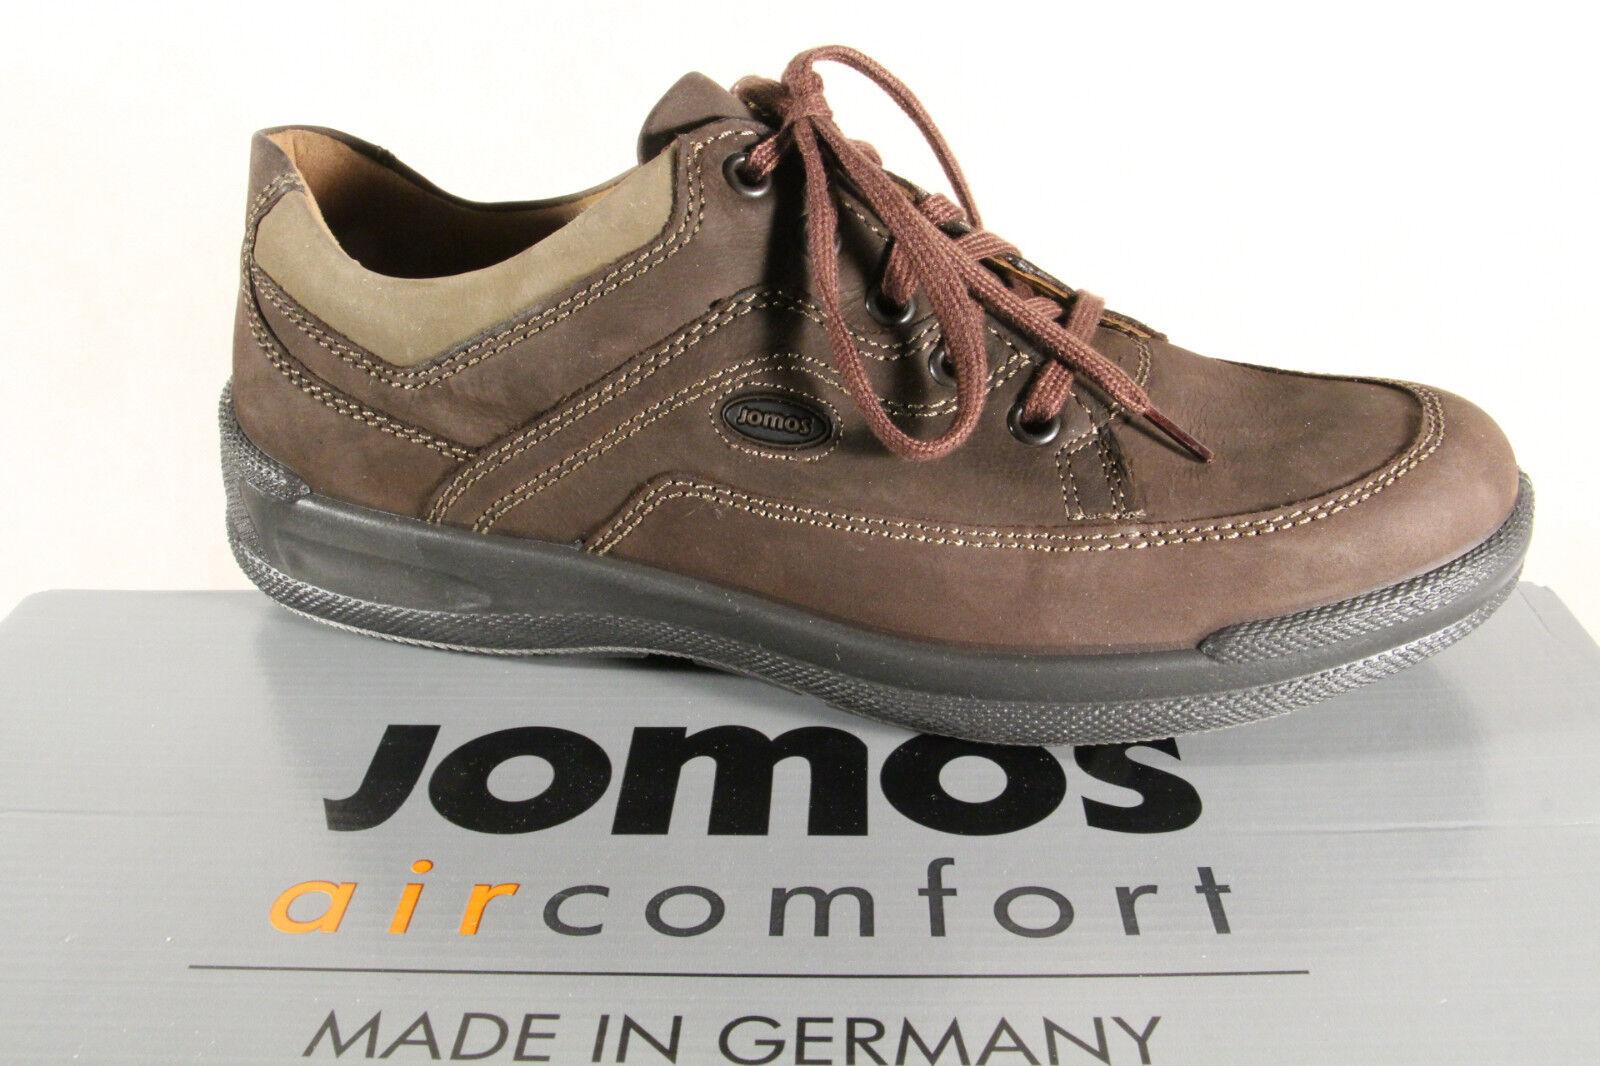 Jomos aircomfort Herren Schnürschuh 419205 Turnschuhe Halbschuh braun Leder  NEU